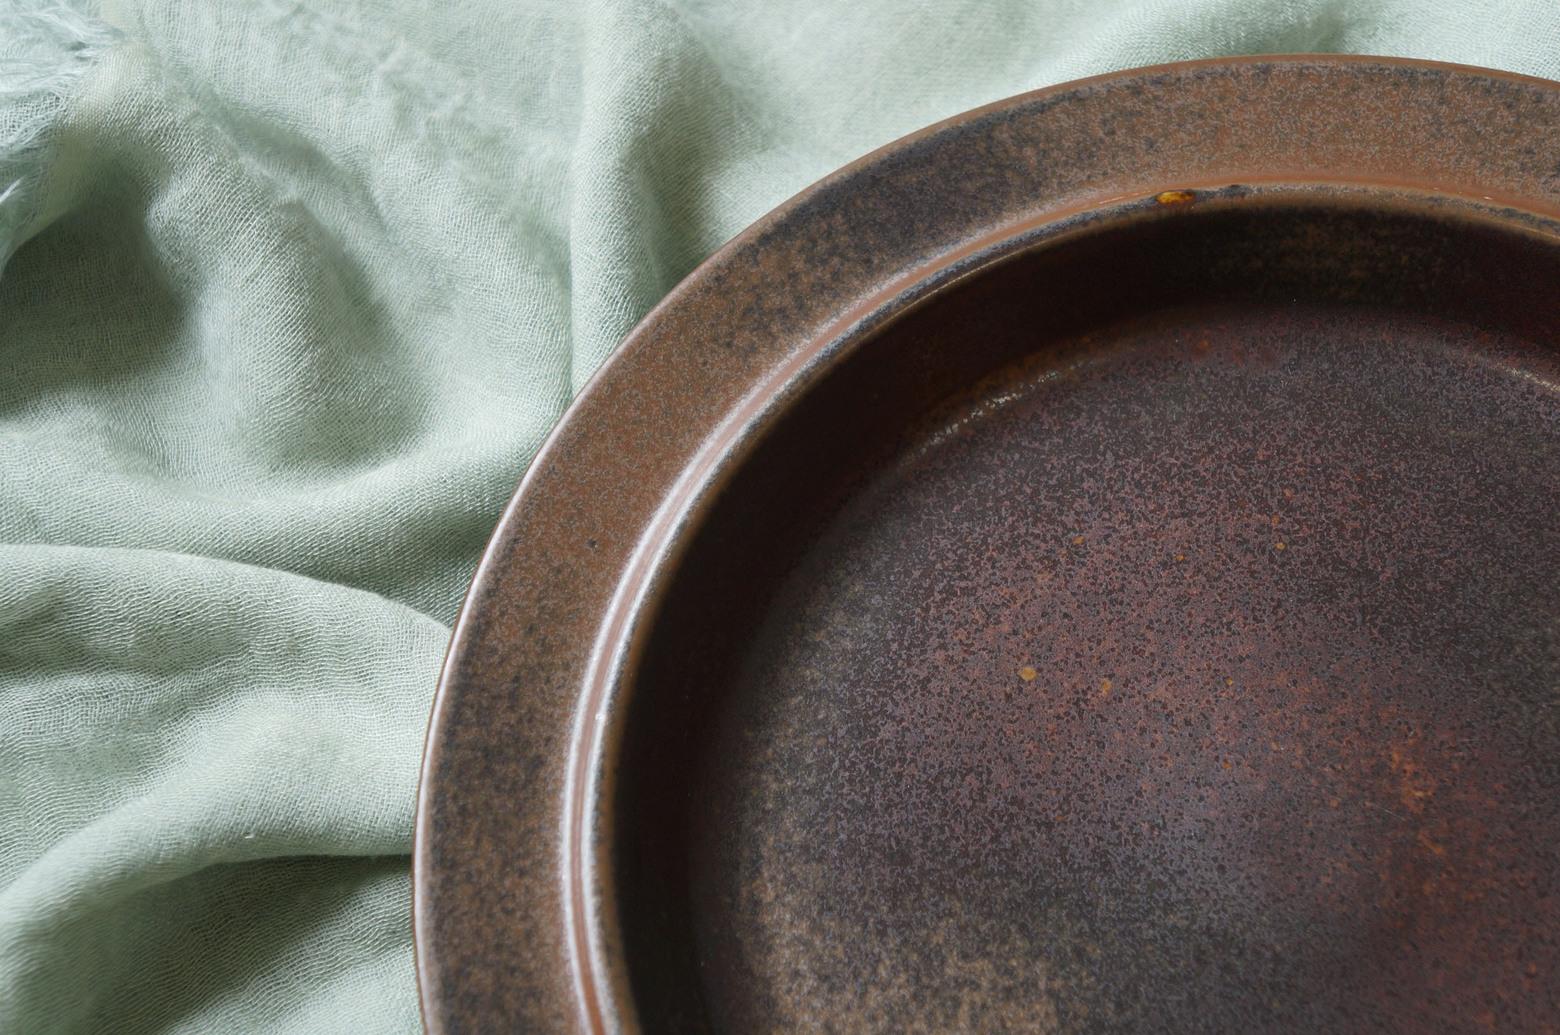 ARABIA Ruska Dinner Plate 25.5cm Ulla Procope/アラビア ルスカ ディナープレート ウラ・プロコッペ フィンランド ヴィンテージ 北欧食器 2